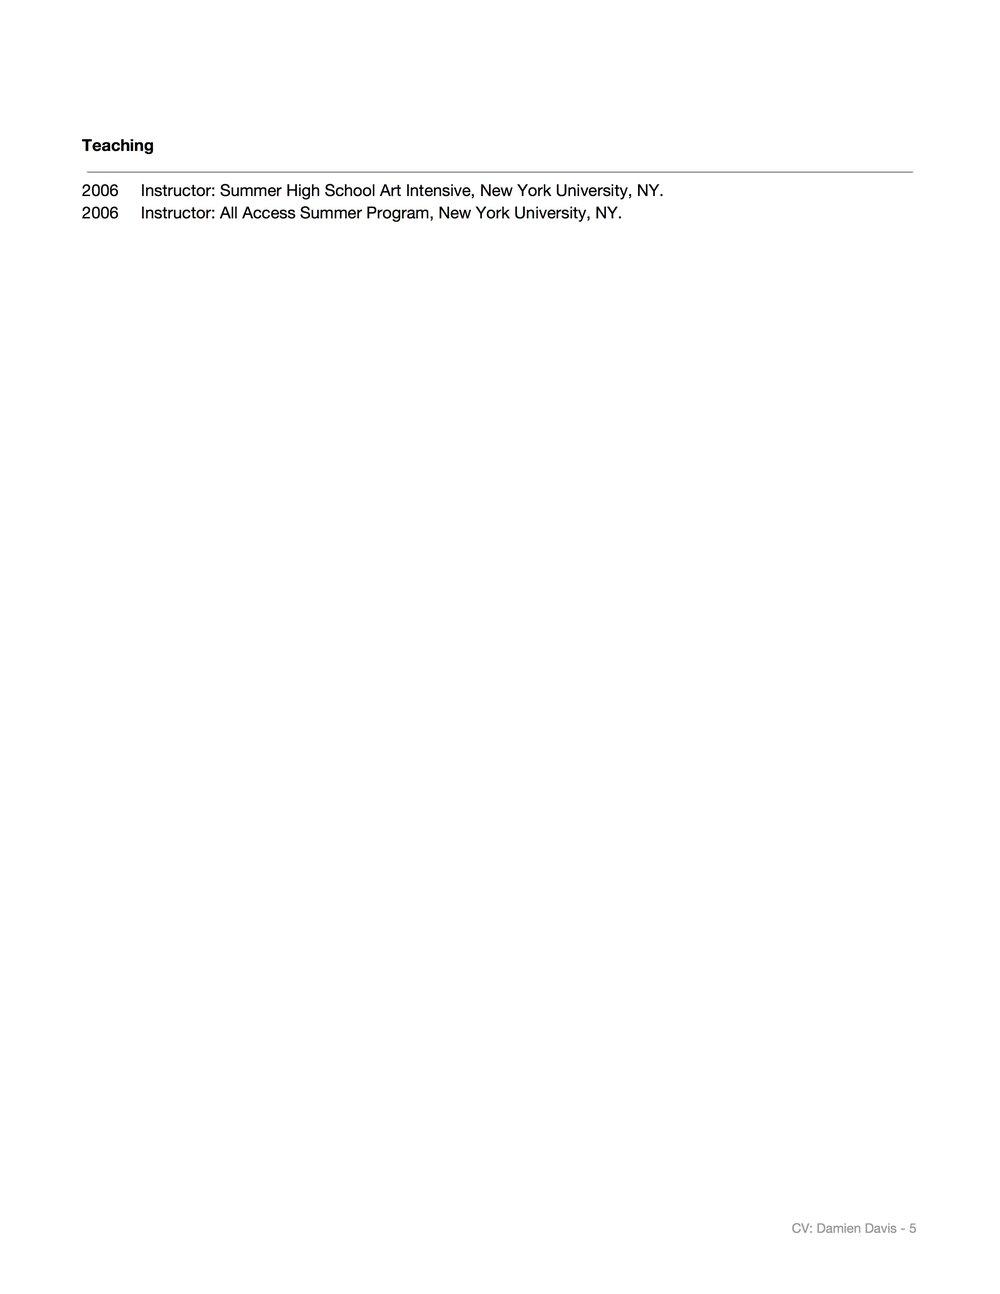 CV (Damien Davis) (2)e.jpg